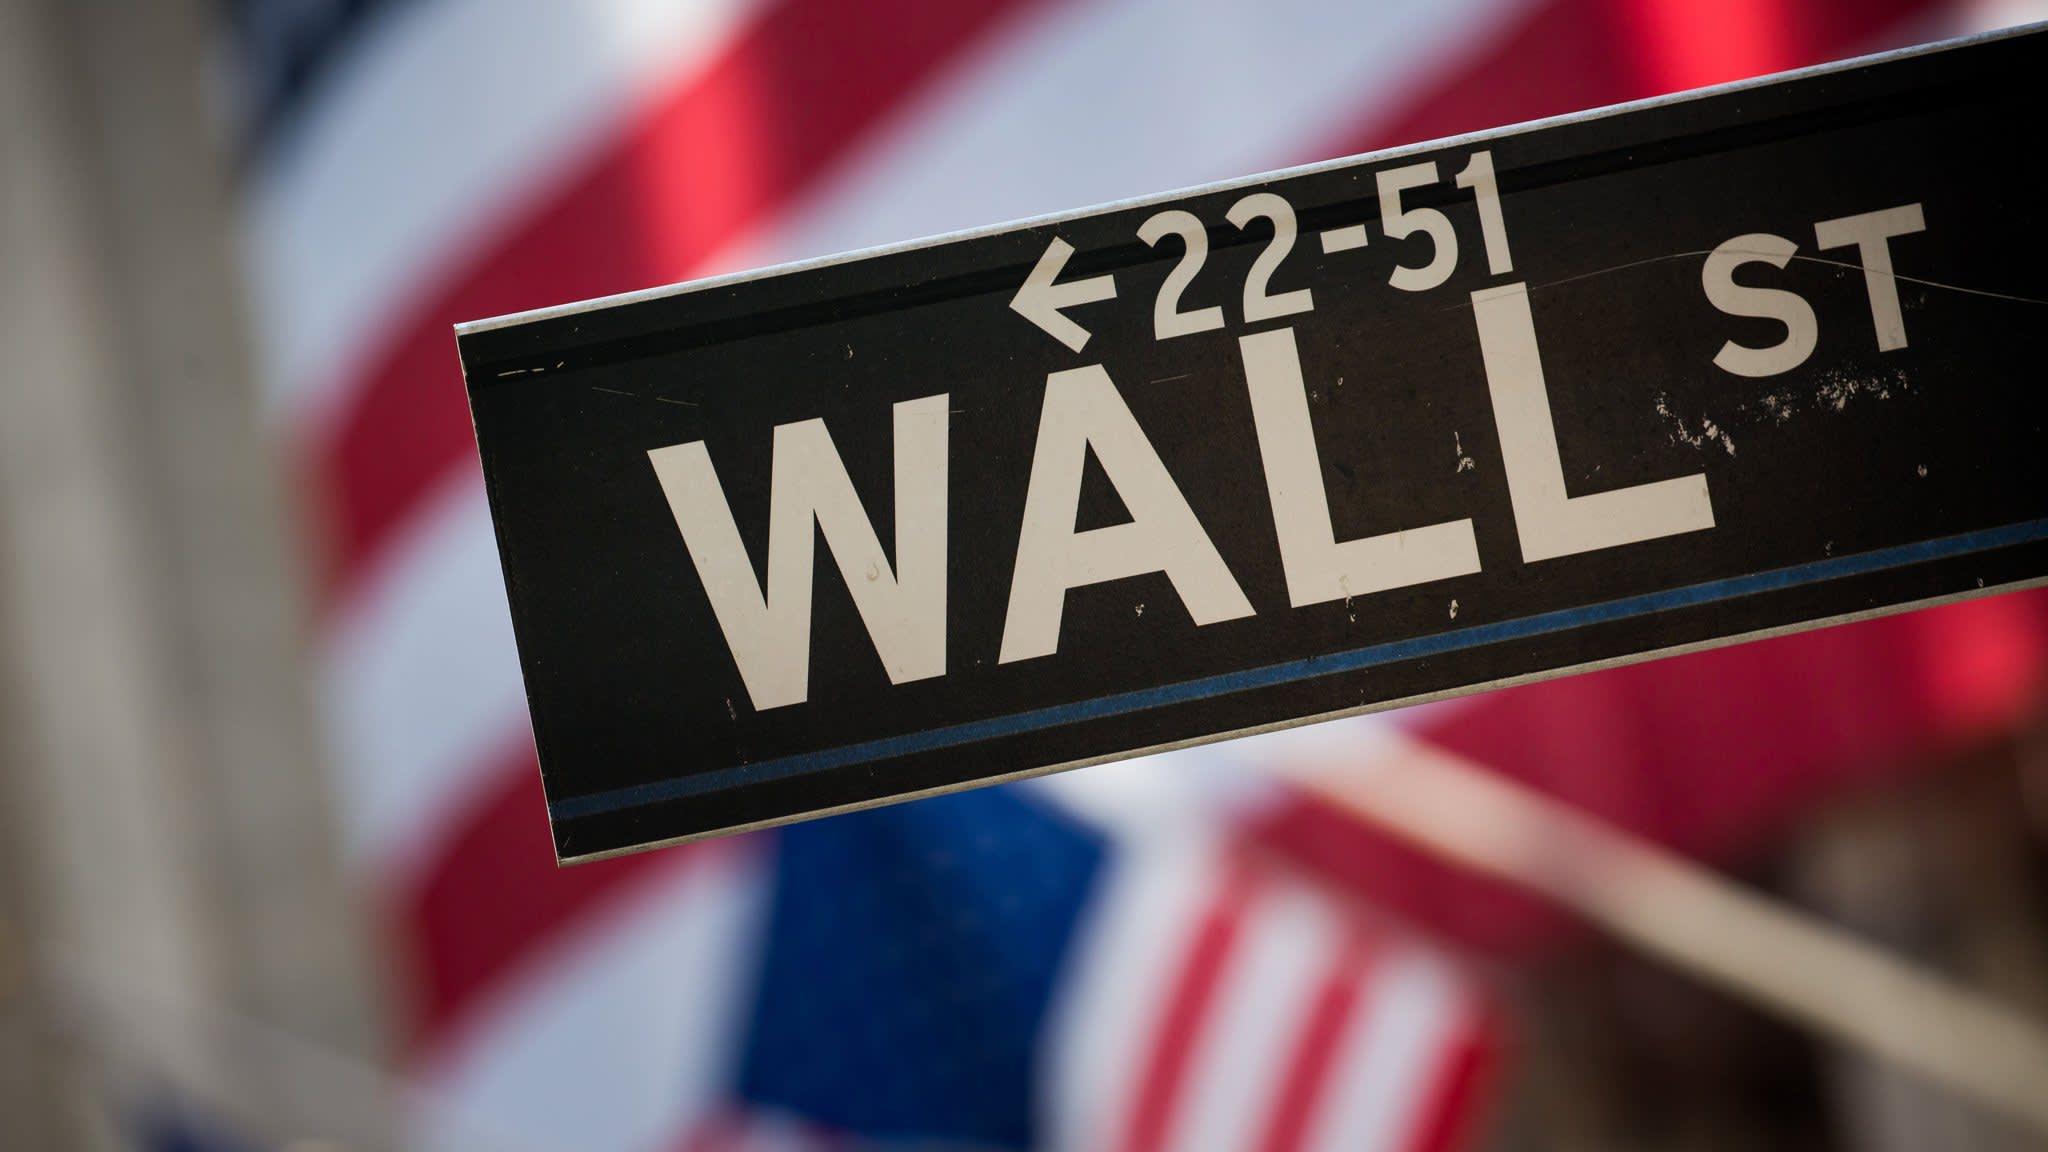 Wall Street trading desks get fillip from return of volatility